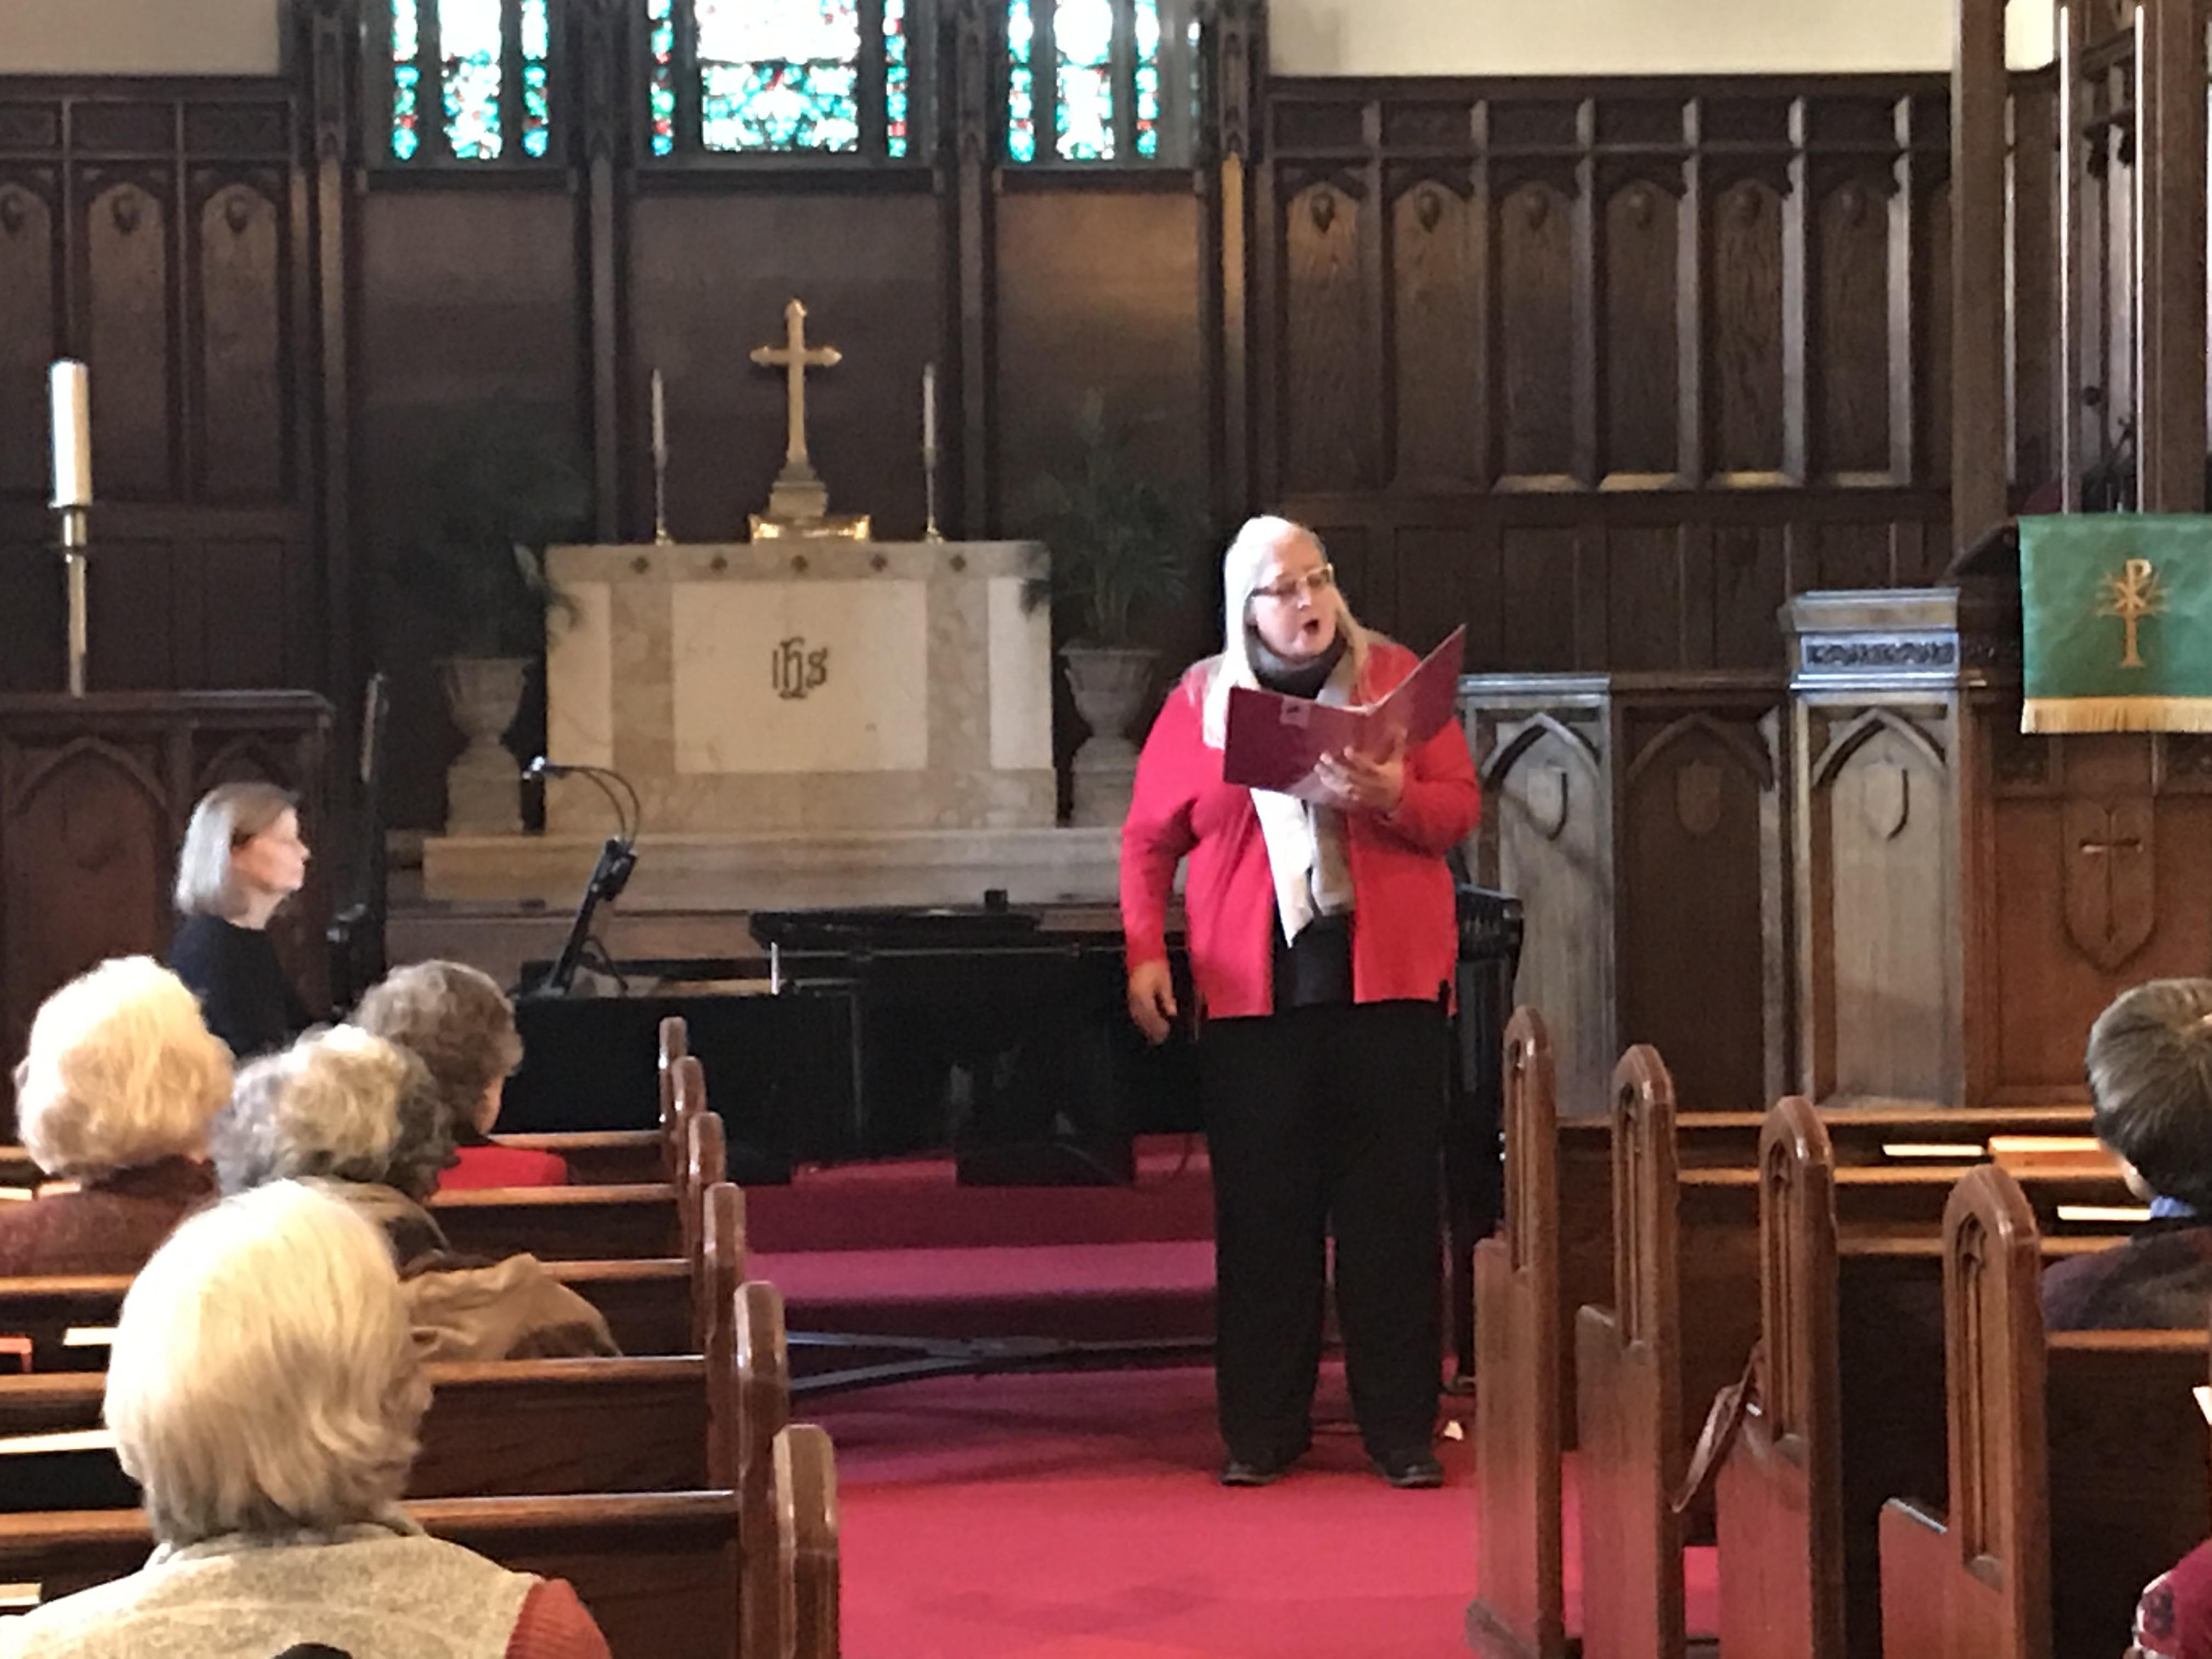 KathyC. guest, Janet Mensen Reynolds